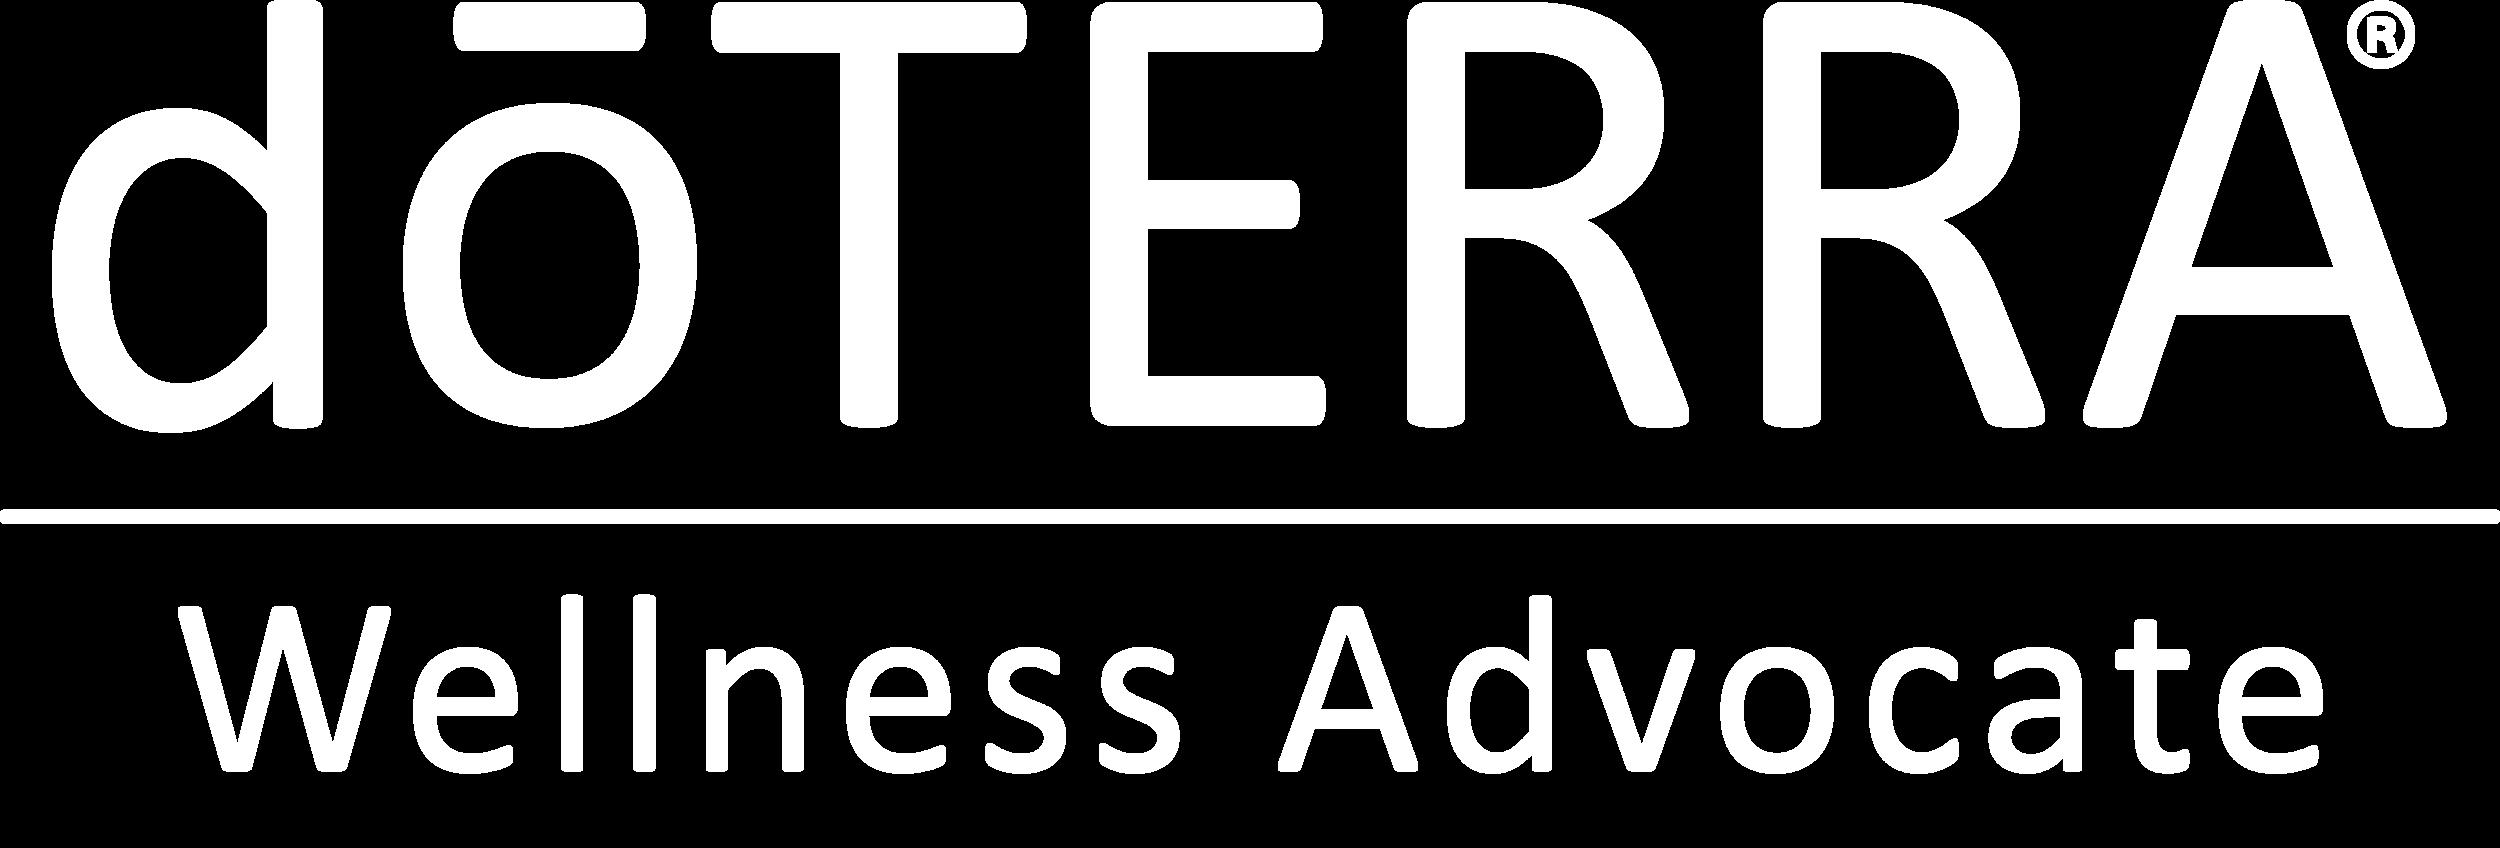 doTERRA wellness advocate ontario